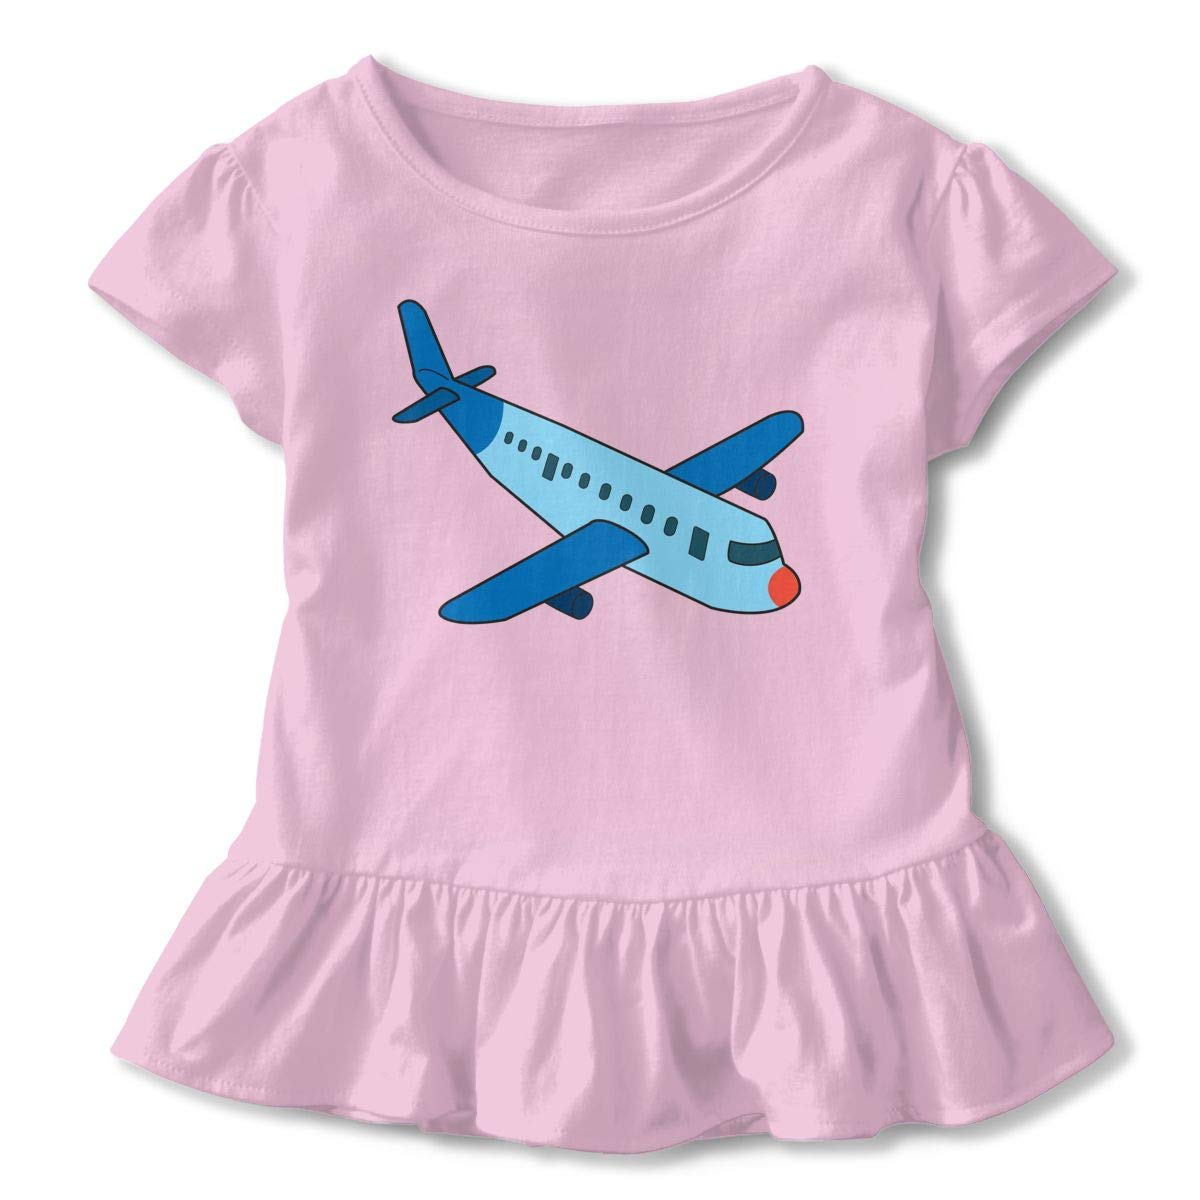 NMDJC CCQ Cartoon Airplane Baby Skirts Fashion Kids T Shirt Dress Cotton Flounces Jumpsuit